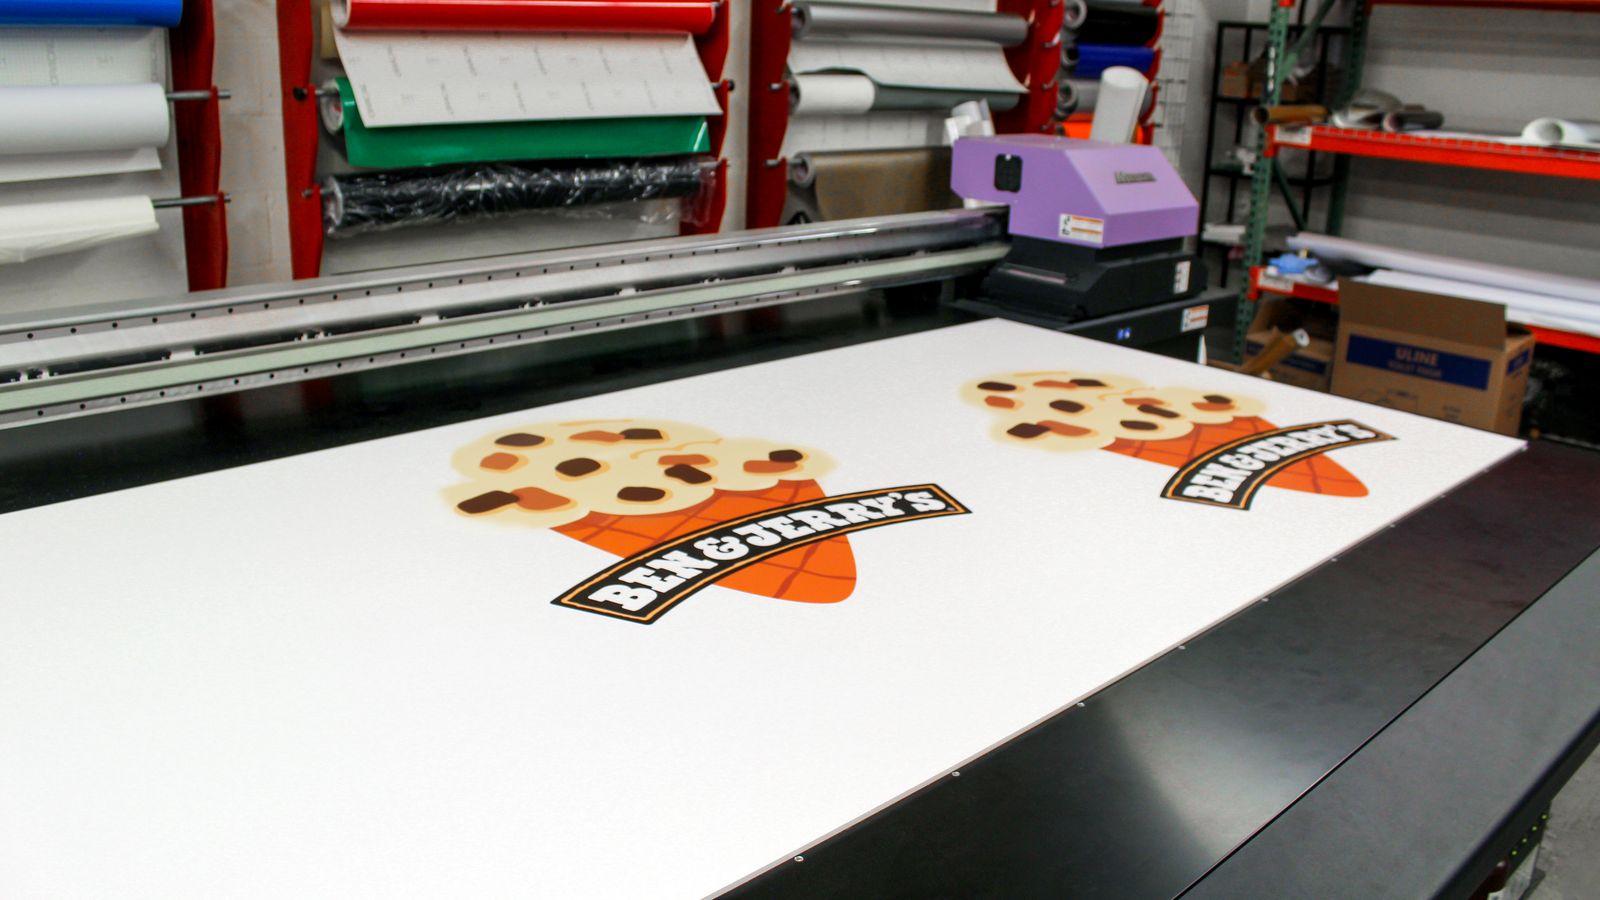 Direct printing on PVC